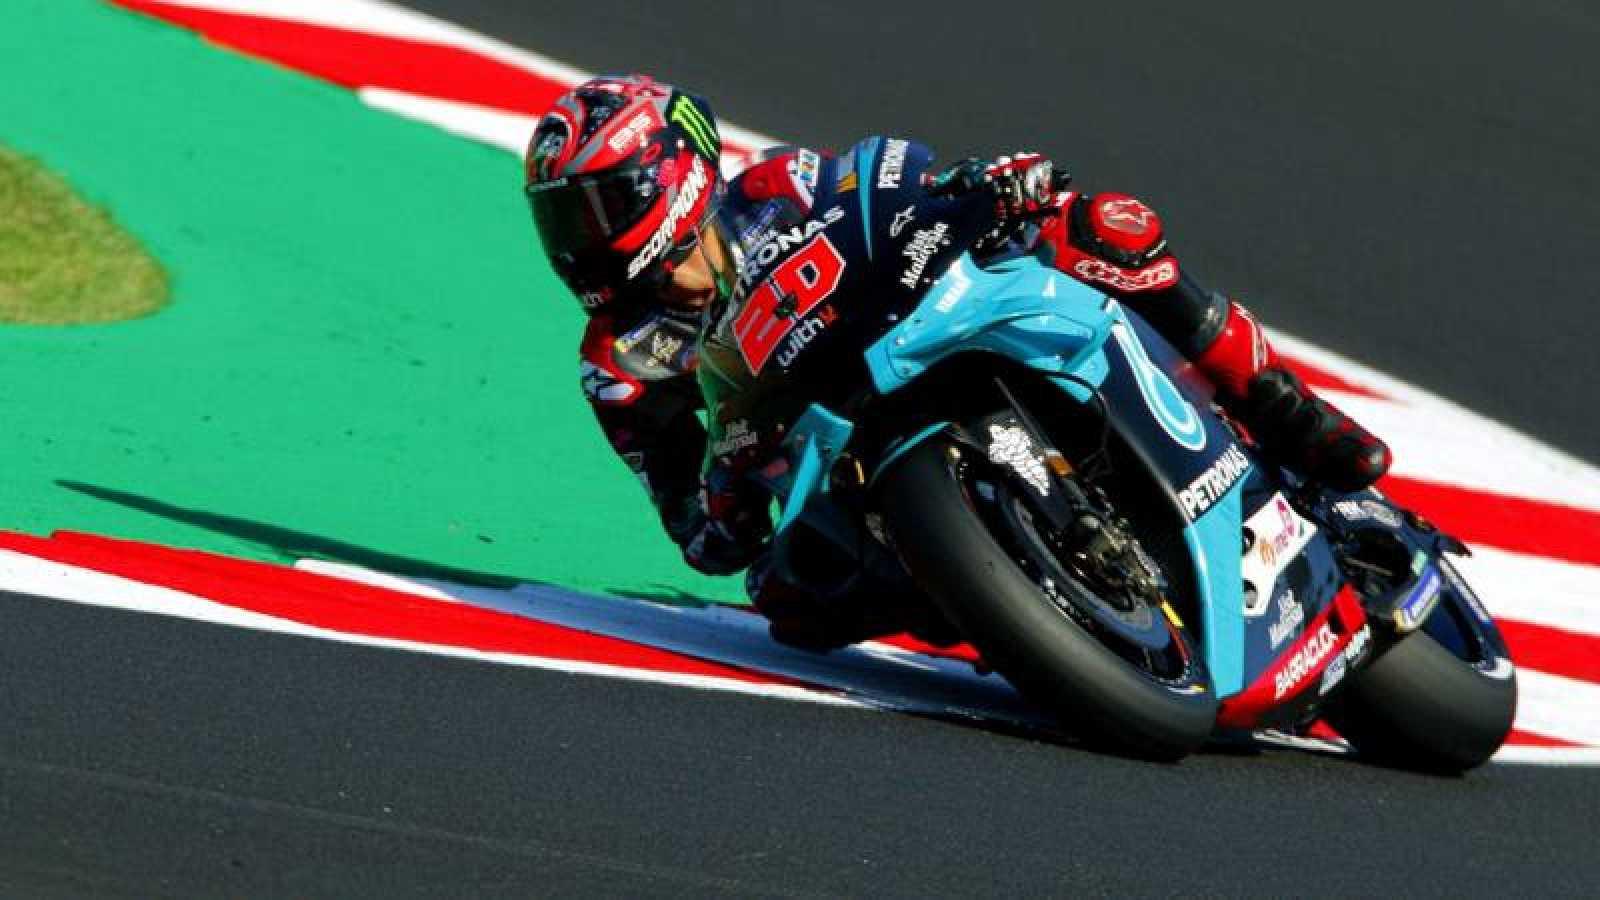 El piloto francés Fabio Quartararo durante el GP de San Marino de MotoGP.